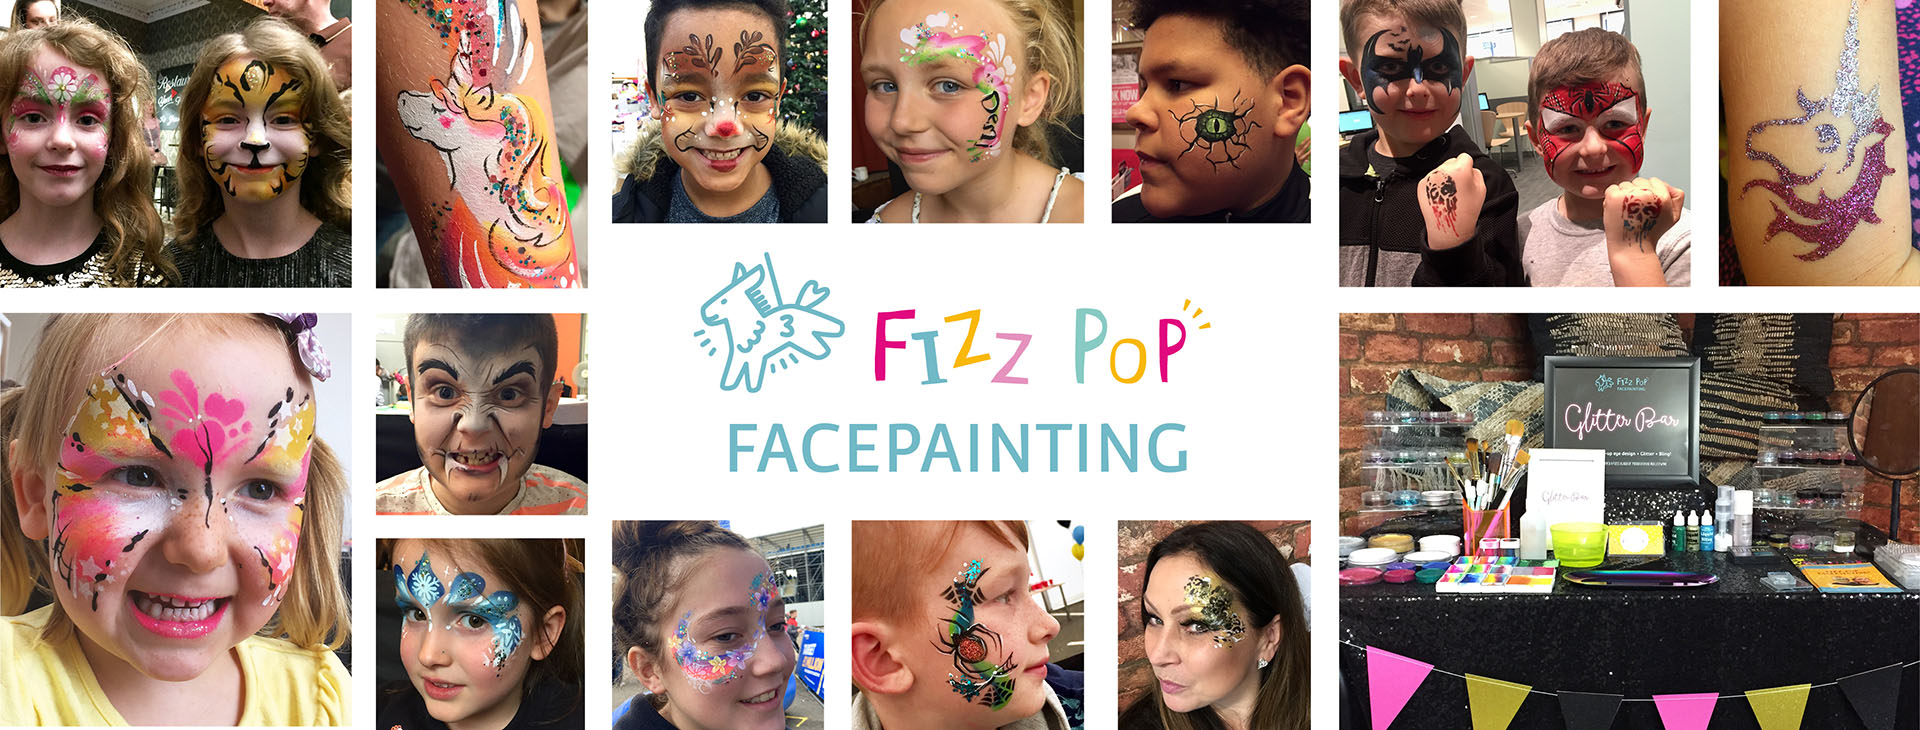 Fizz Pop Facepainting's main image